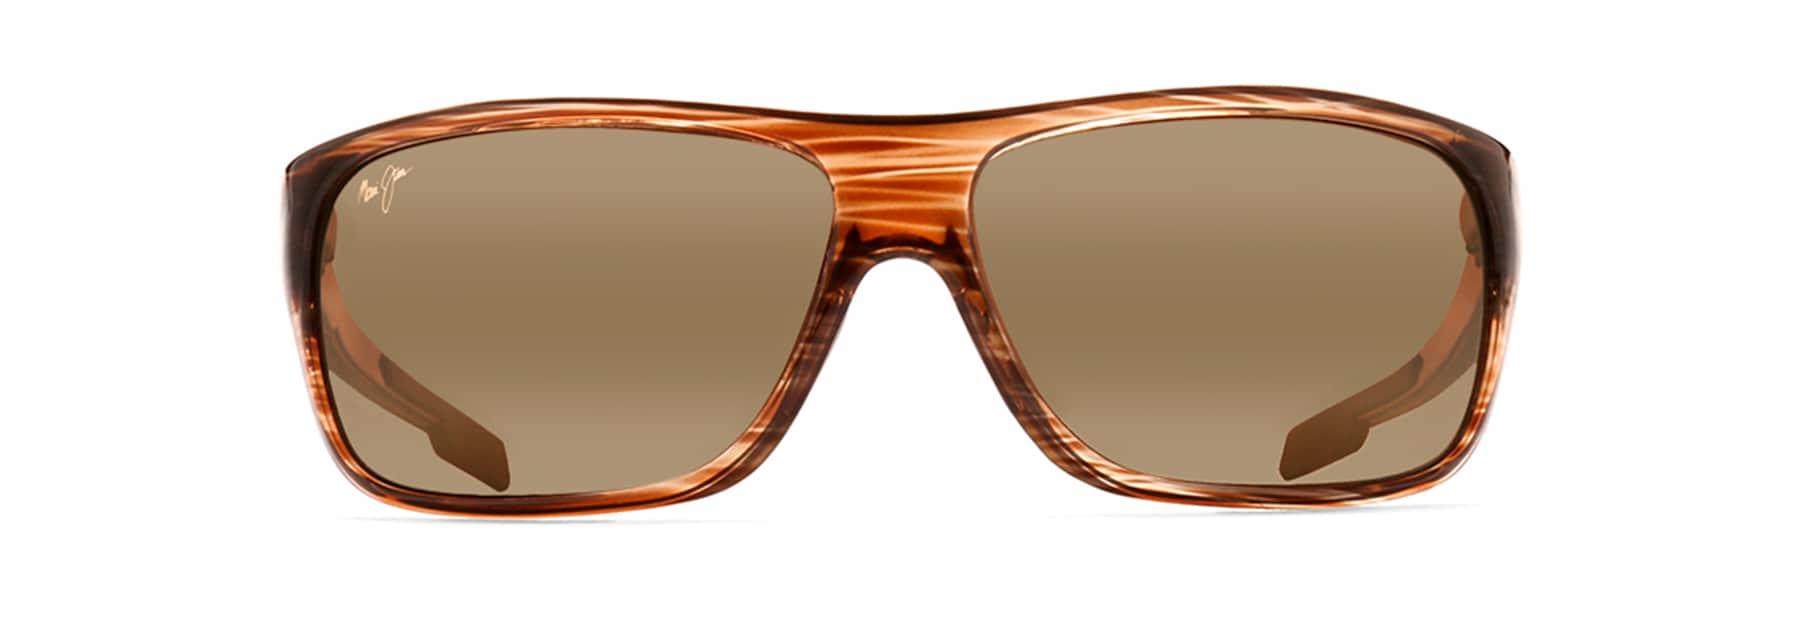 6eea2543dc Island Time Polarized Sunglasses | Maui Jim®